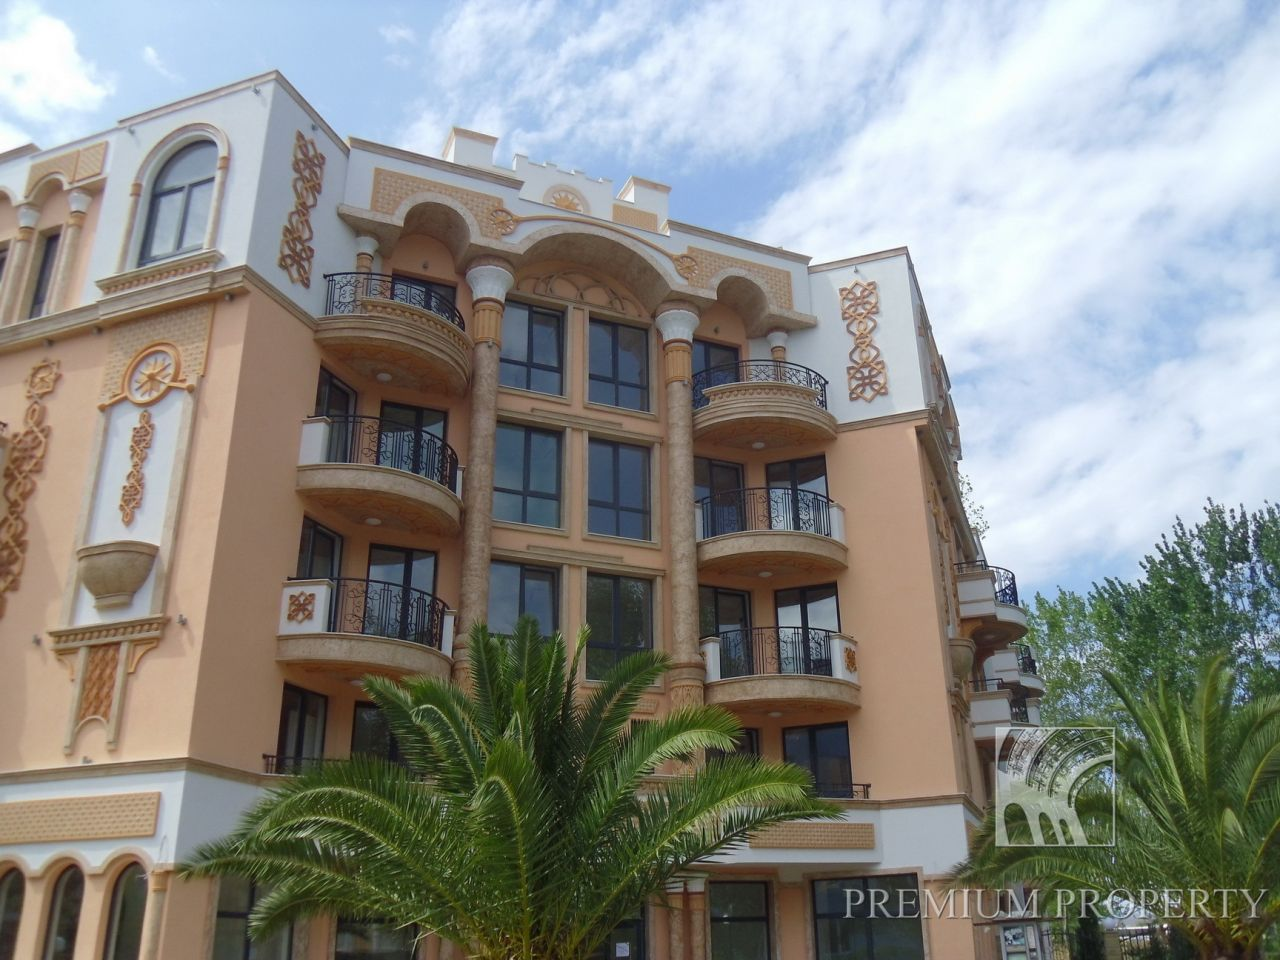 Апартаменты на Солнечном берегу, Болгария, 52.83 м2 - фото 1